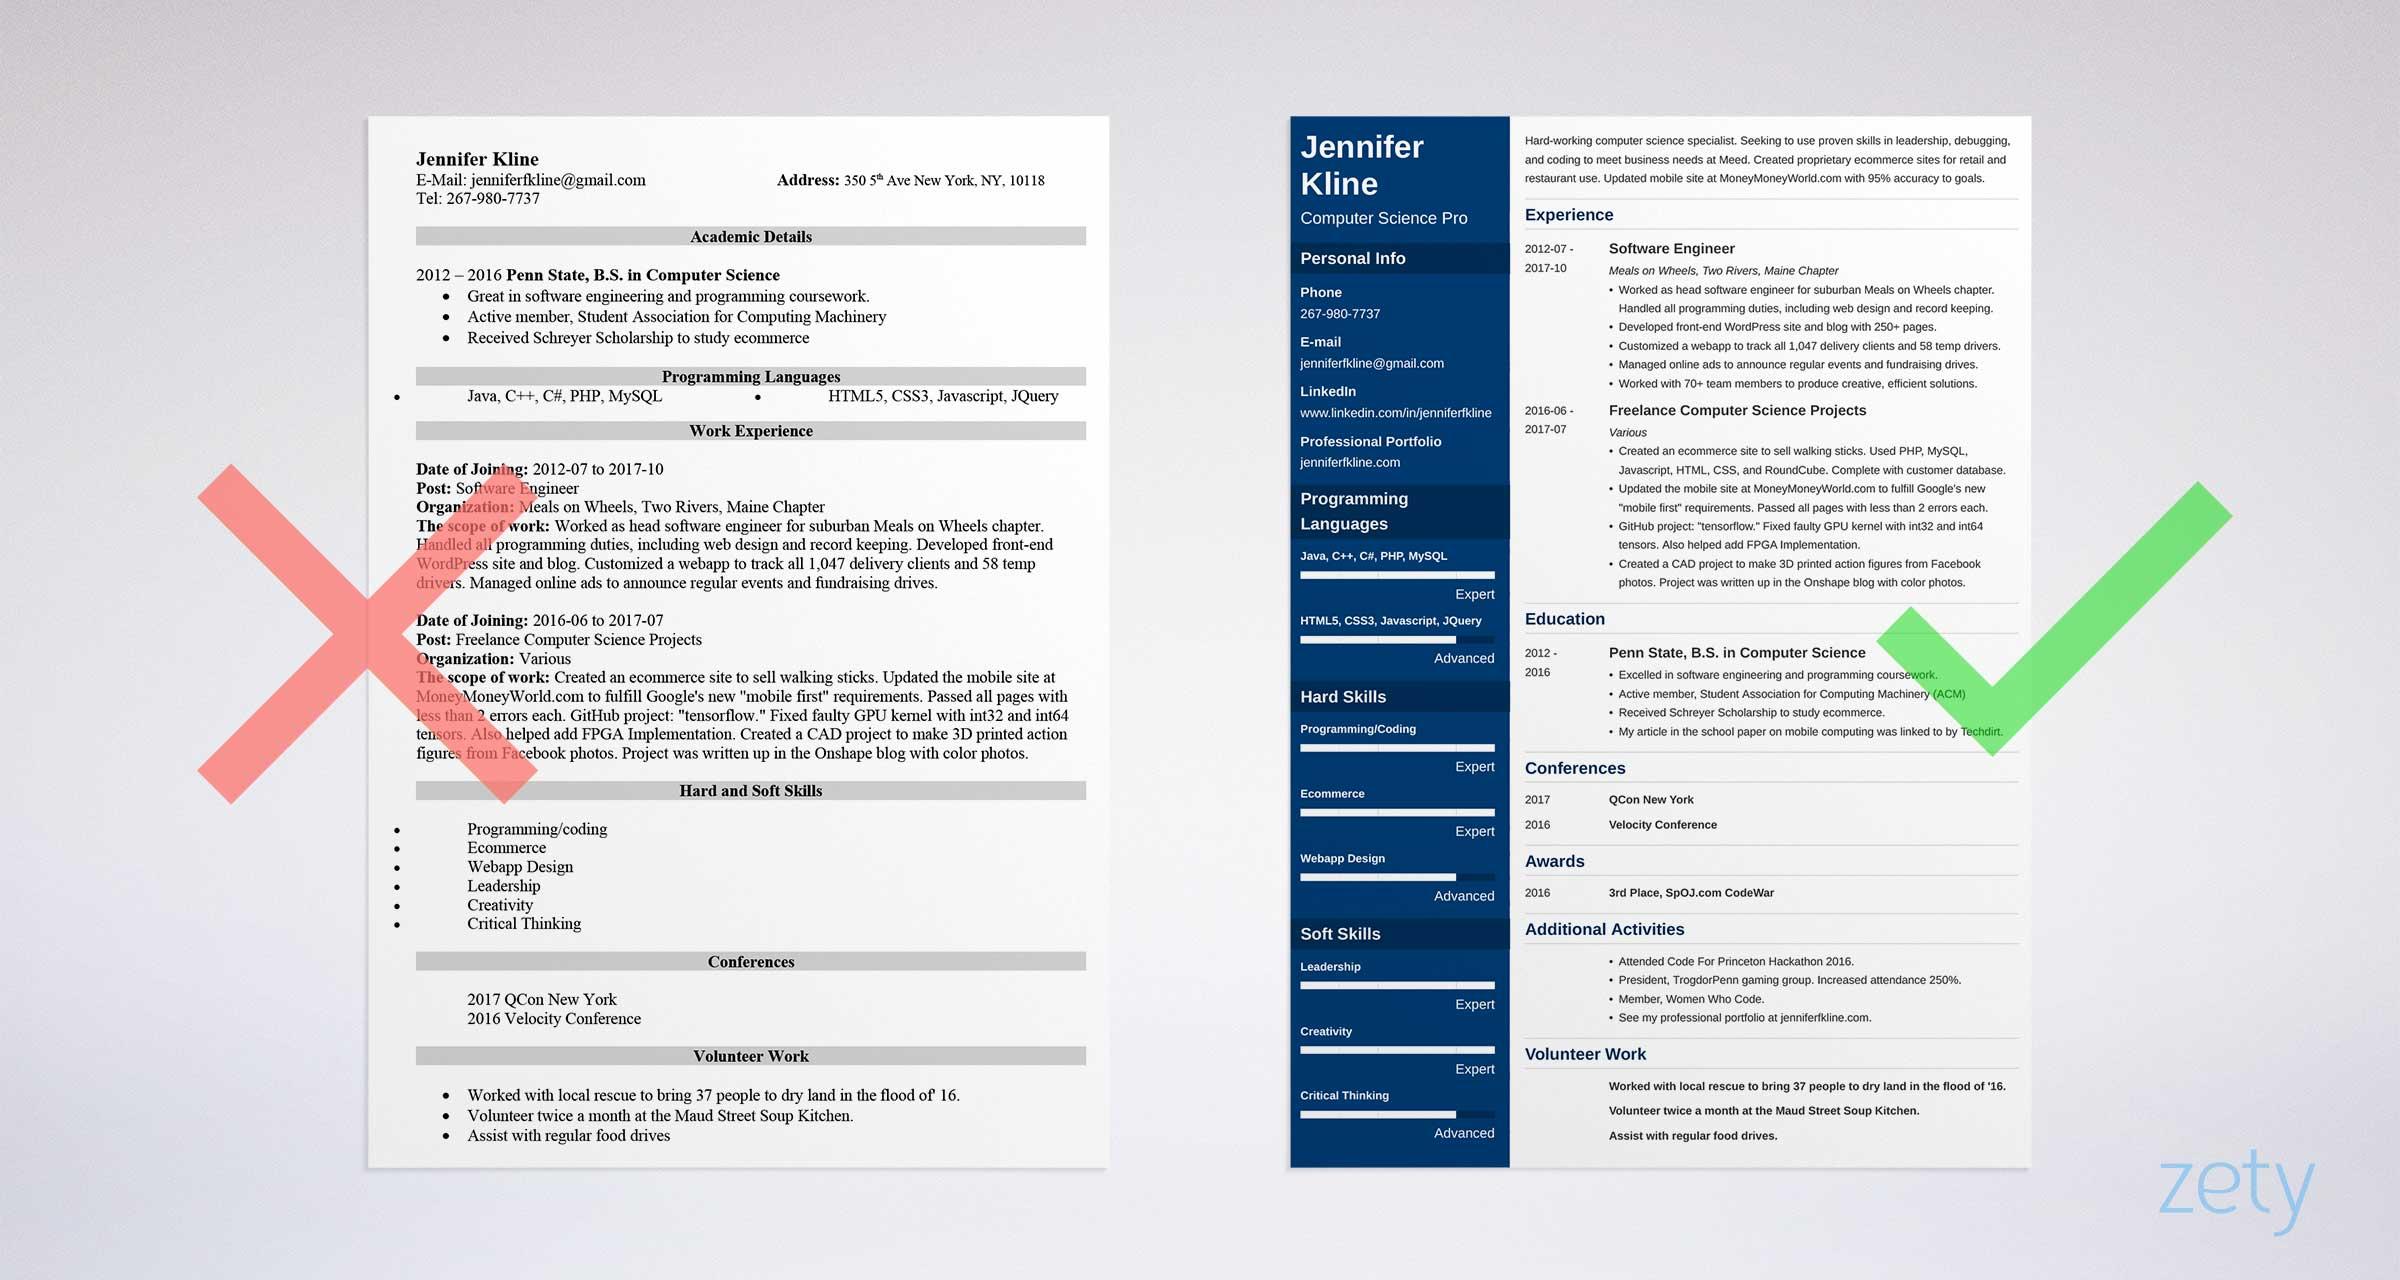 listing volunteer experience on resume examples